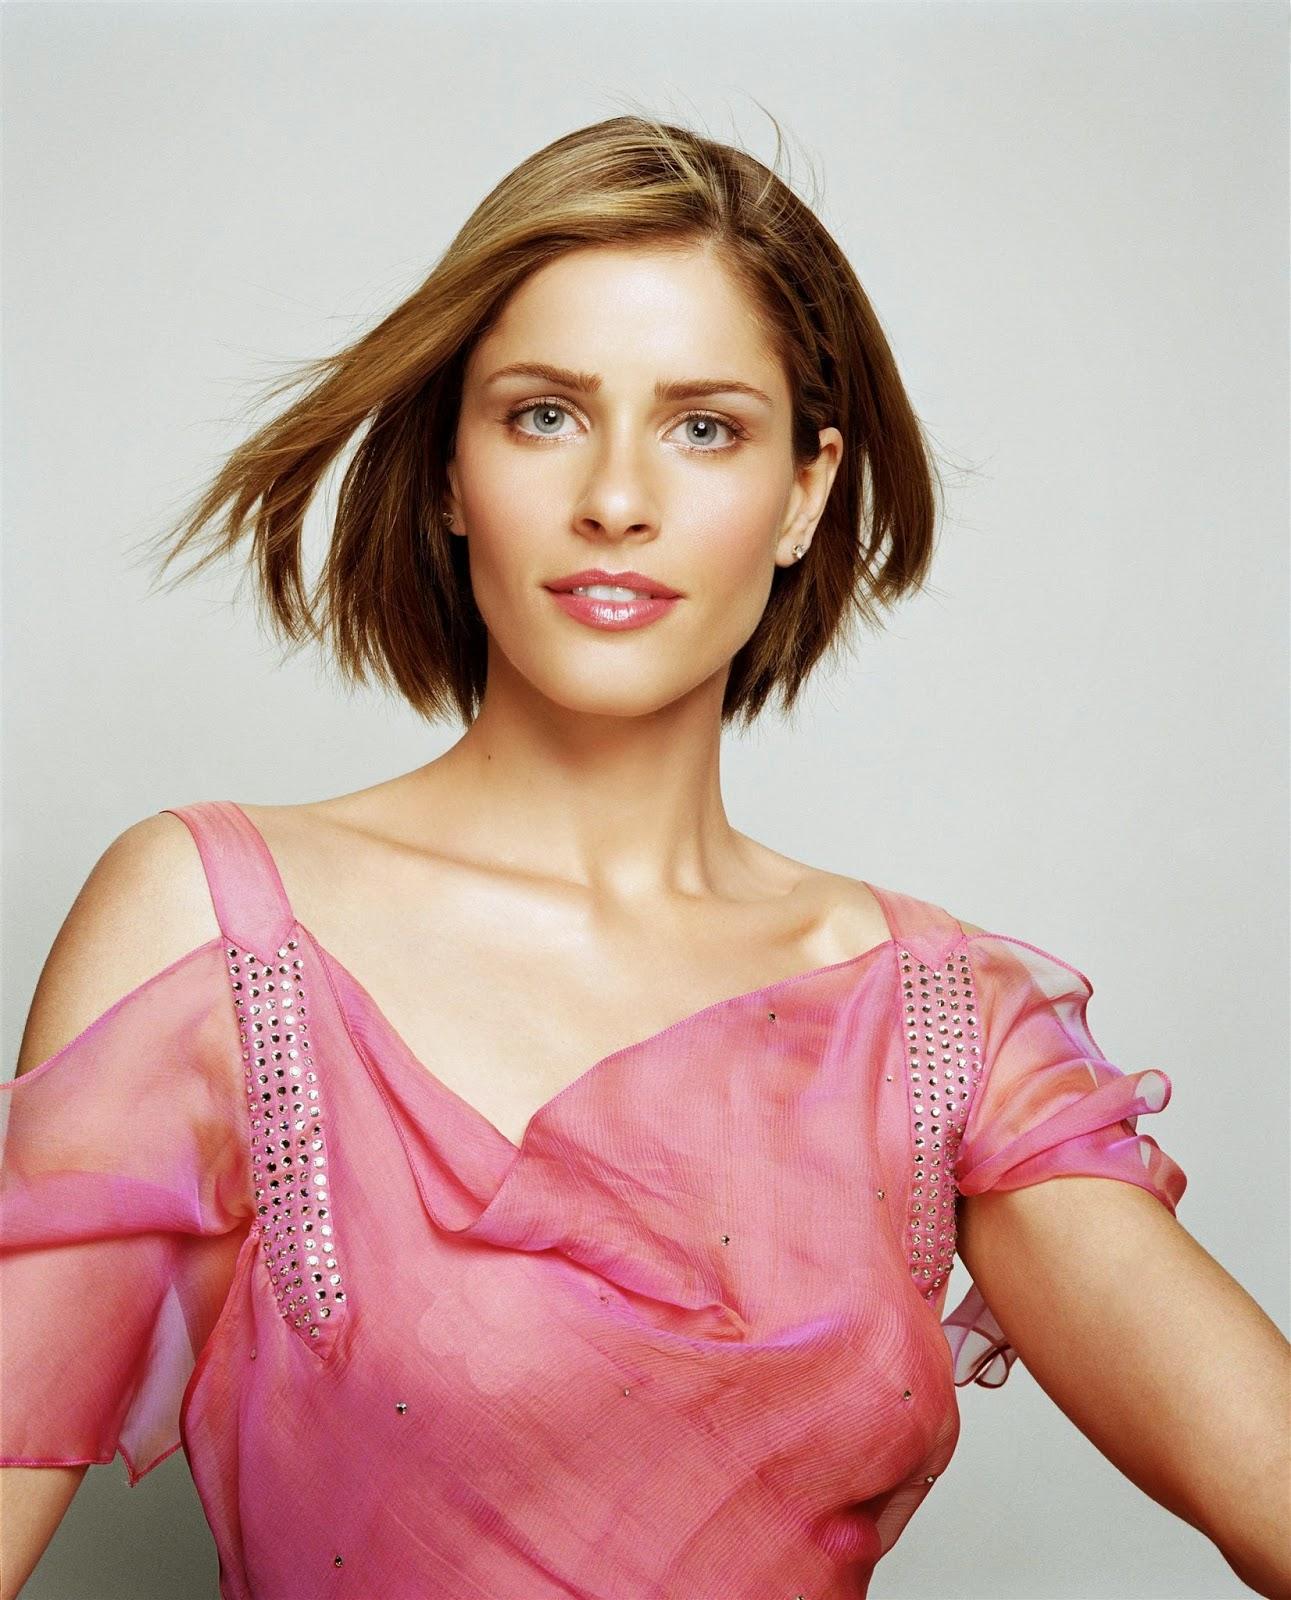 Hollywood Actress Wallpaper: Amanda Peet HD Wallpapers